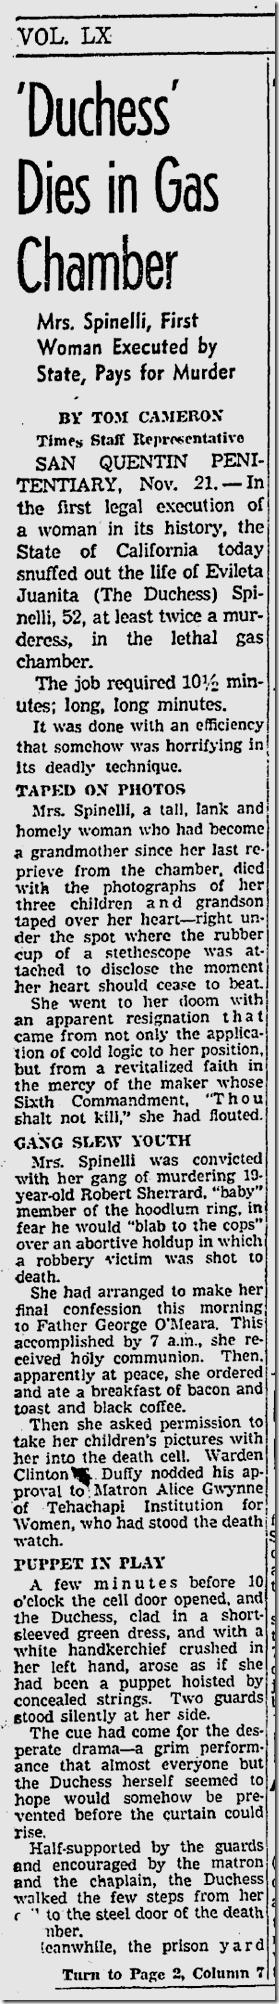 Nov. 22, 1941, Spinelli Execution